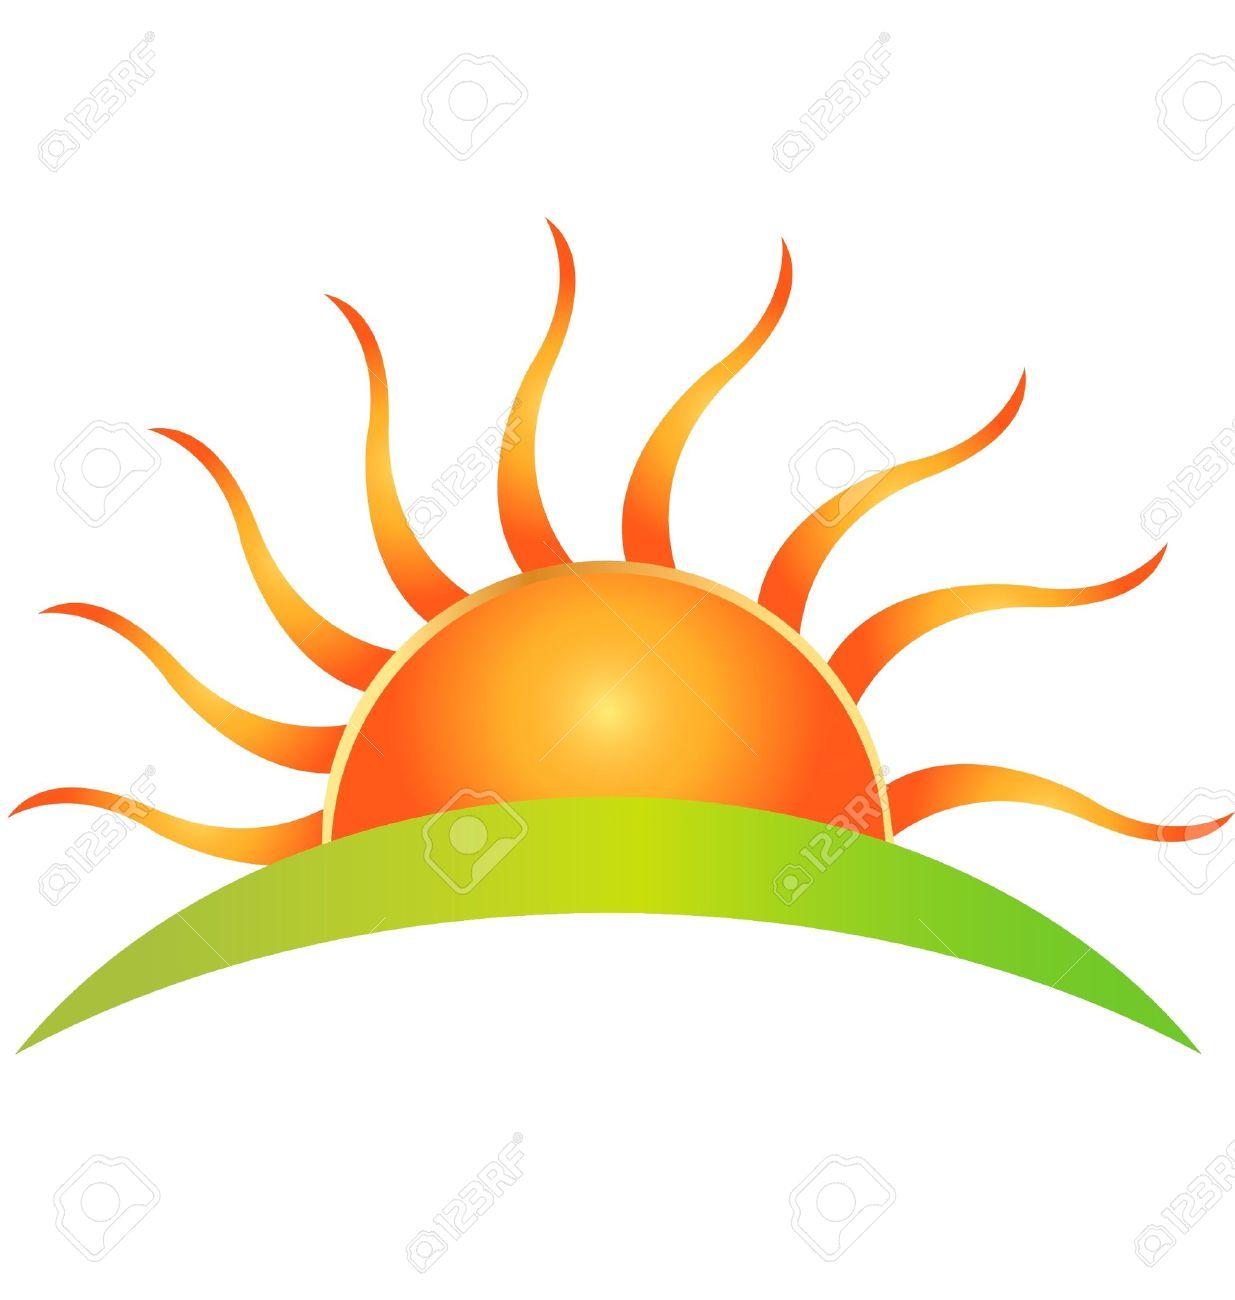 sun logo royalty free cliparts vectors and stock illustration rh 123rf com Half Sun Clip Art Vector free vector halftone dots ai